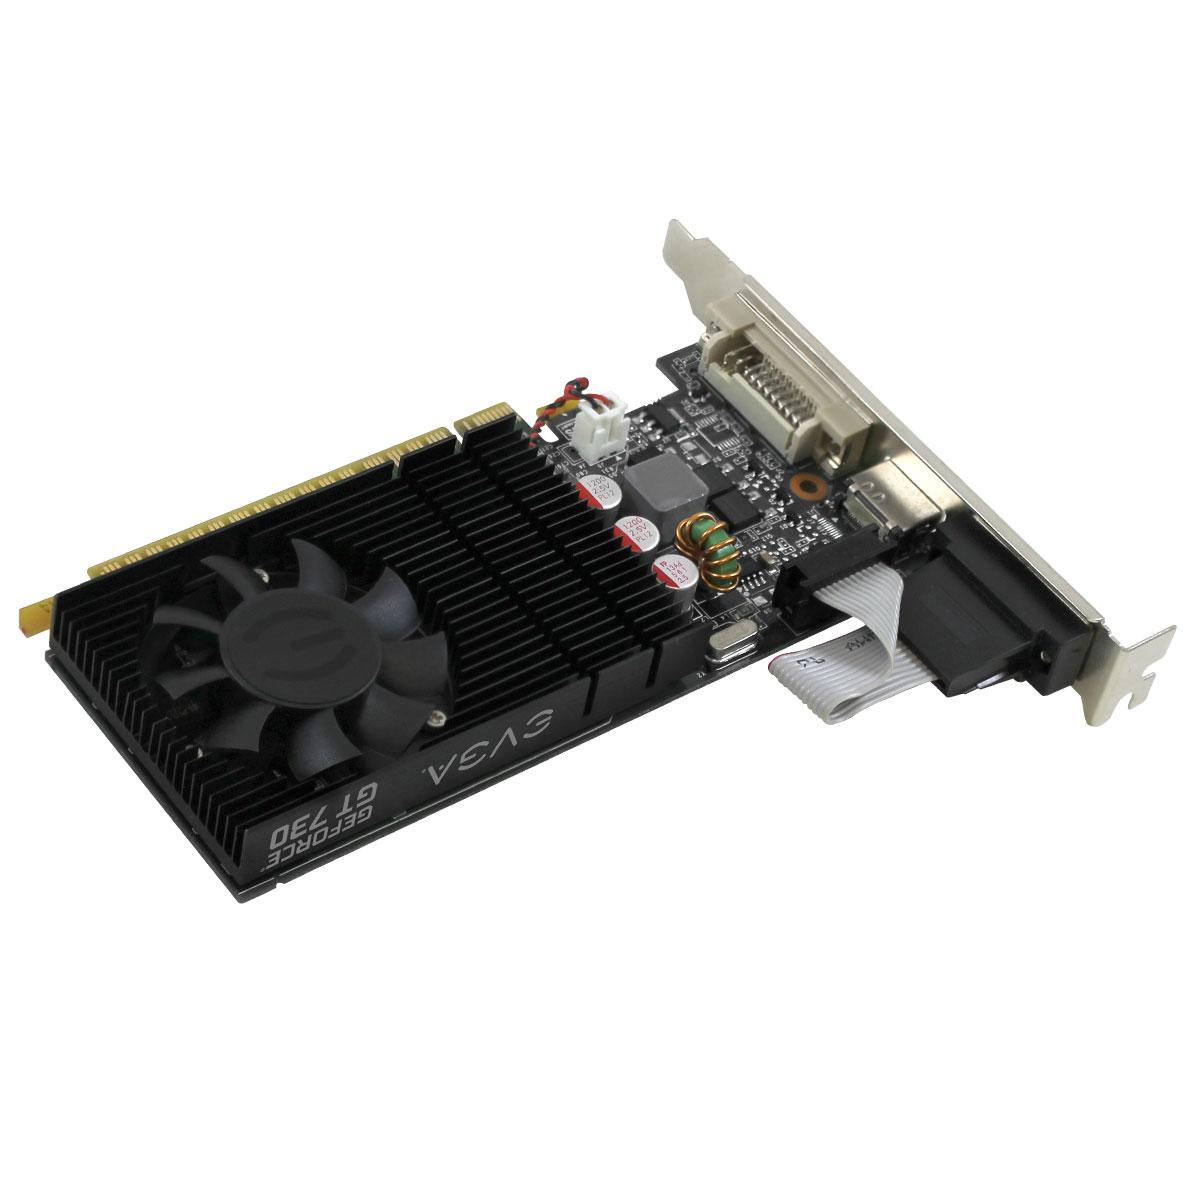 EVGA - FR - Produits - EVGA GeForce GT 730 2GB (Low Profile) - 02G-P3-2732-KR